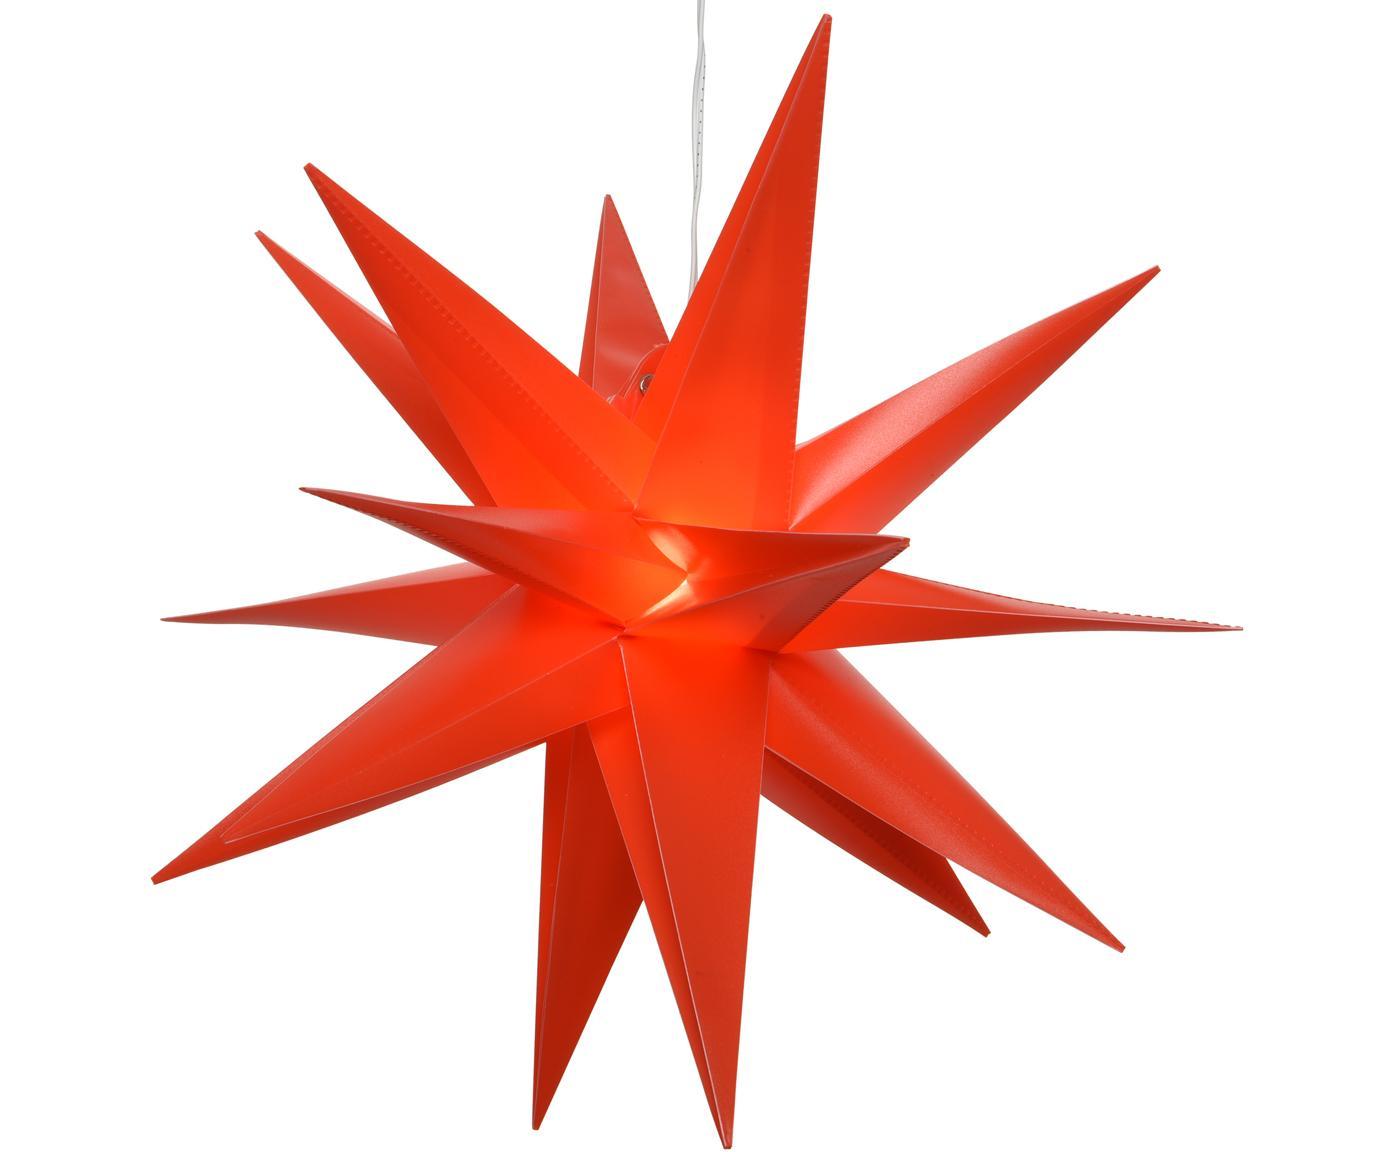 Lampa LED na baterie Zing, Czerwony, Ø 30 cm